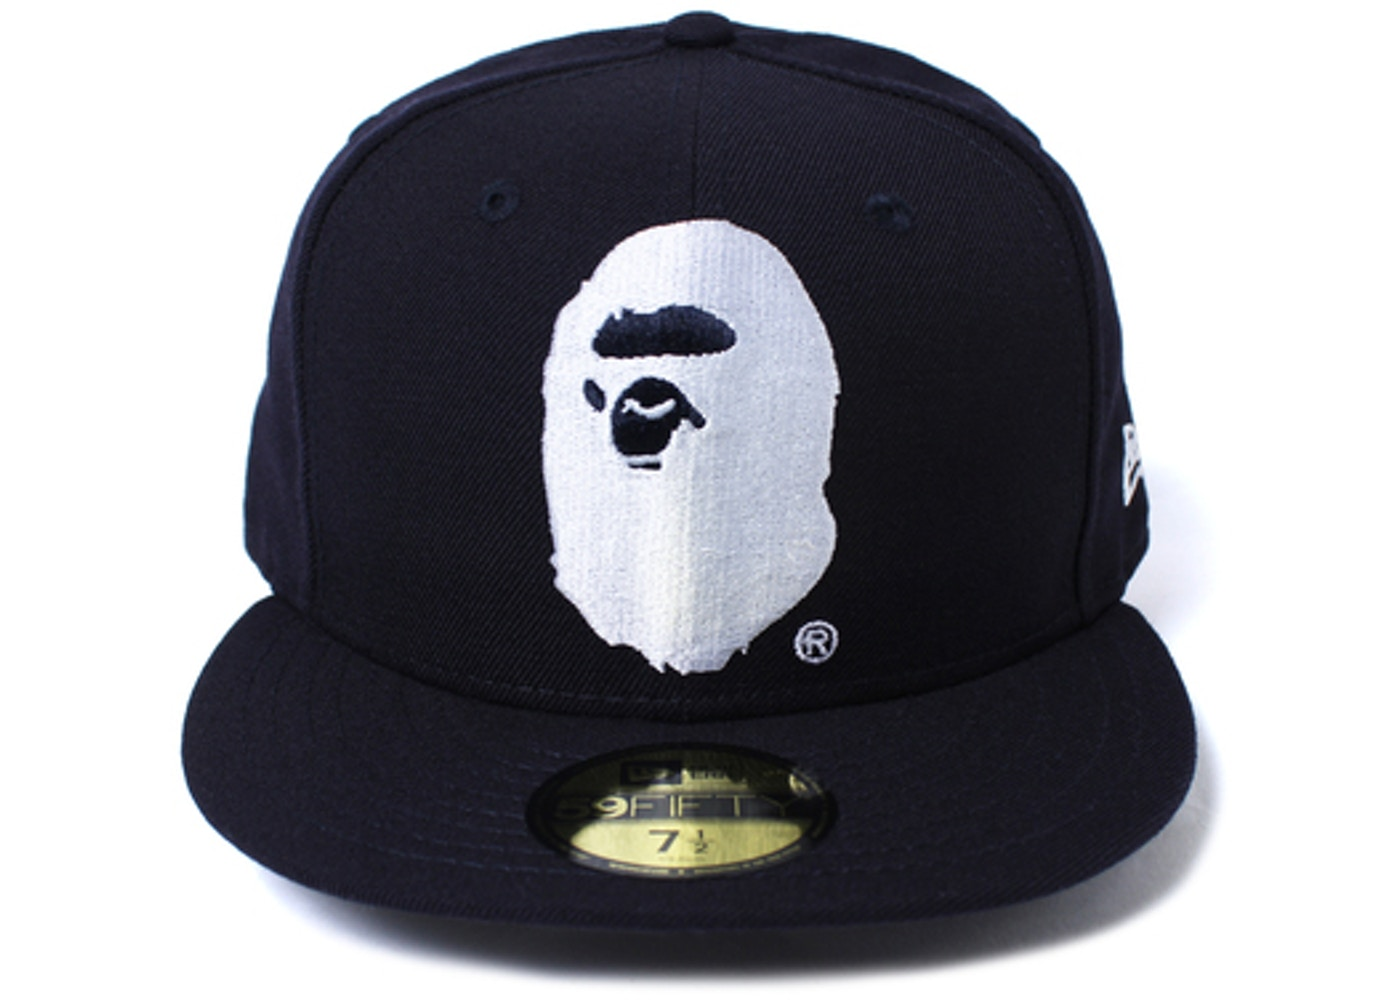 0bb7966a9f6 Buy   Sell Streetwear - Supreme